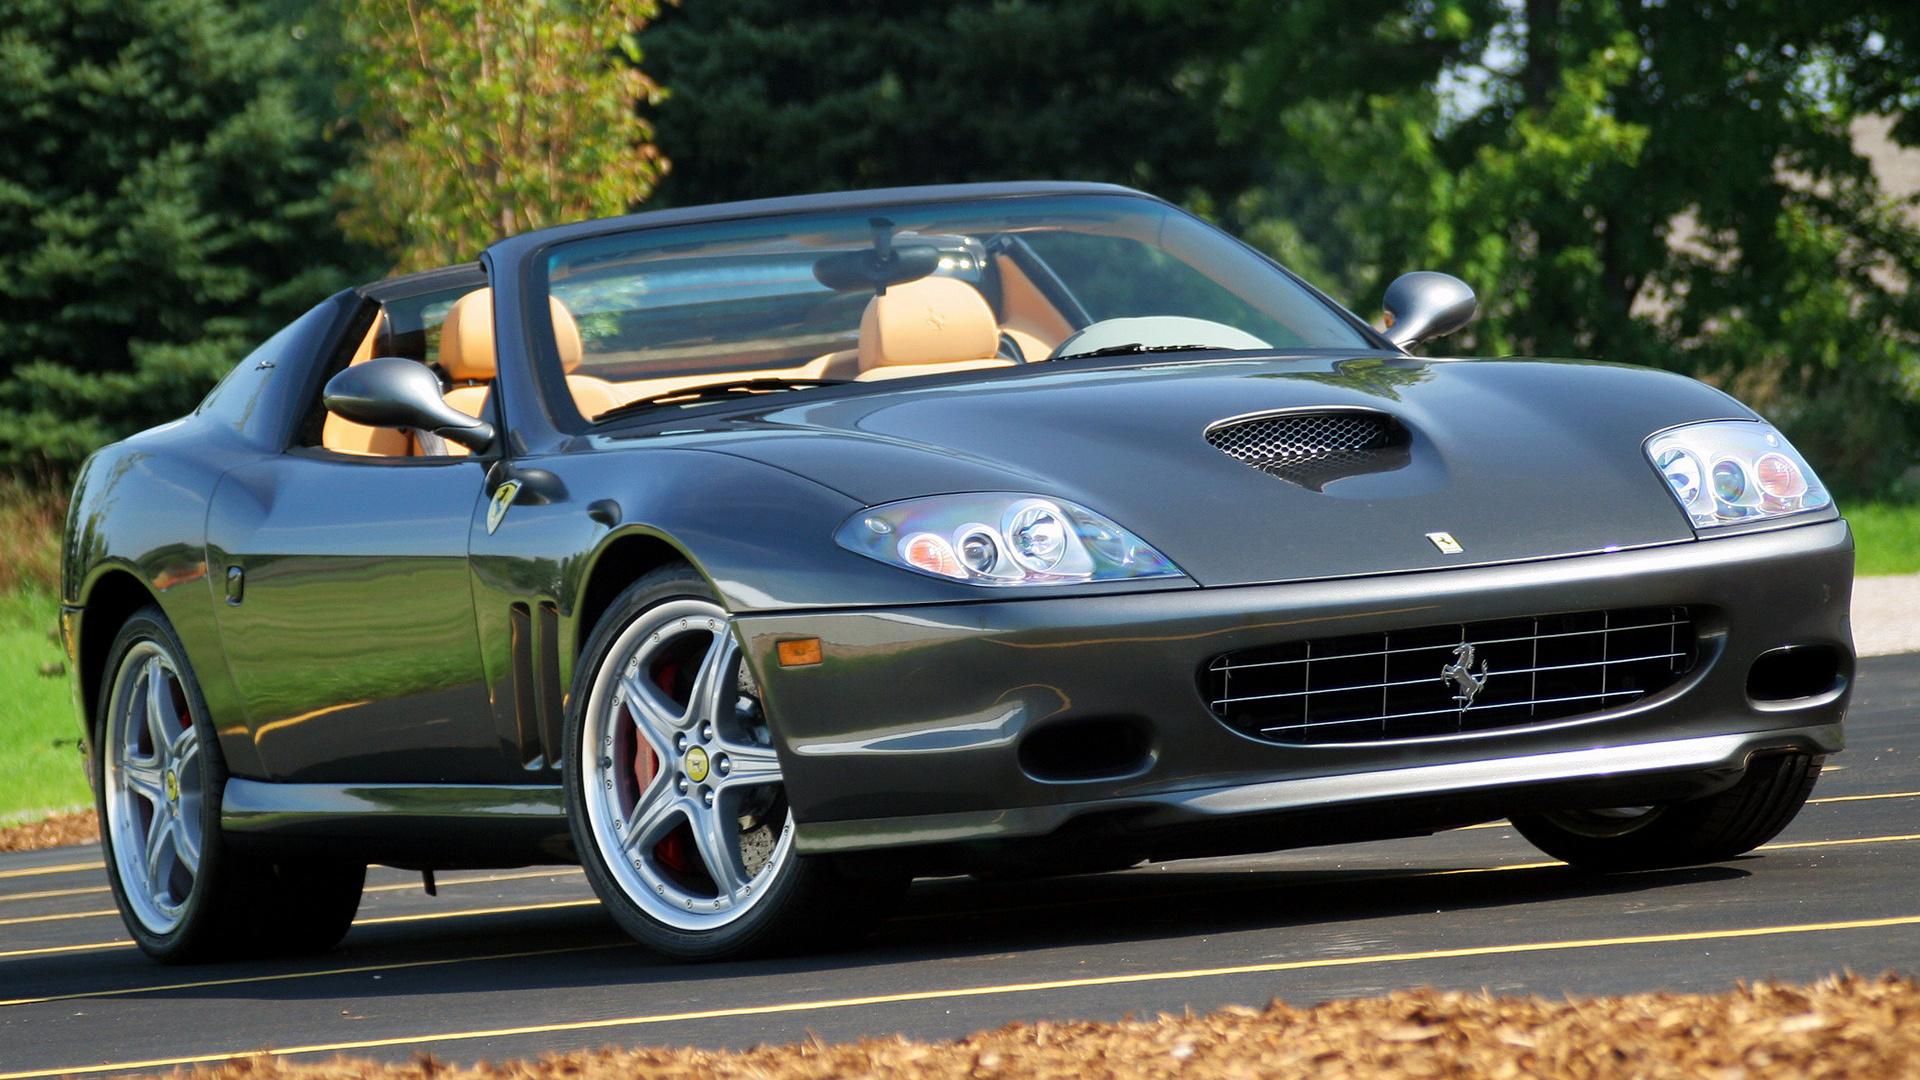 2005 Ferrari Superamerica Us Hintergrundbilder Und Wallpaper In Hd Car Pixel